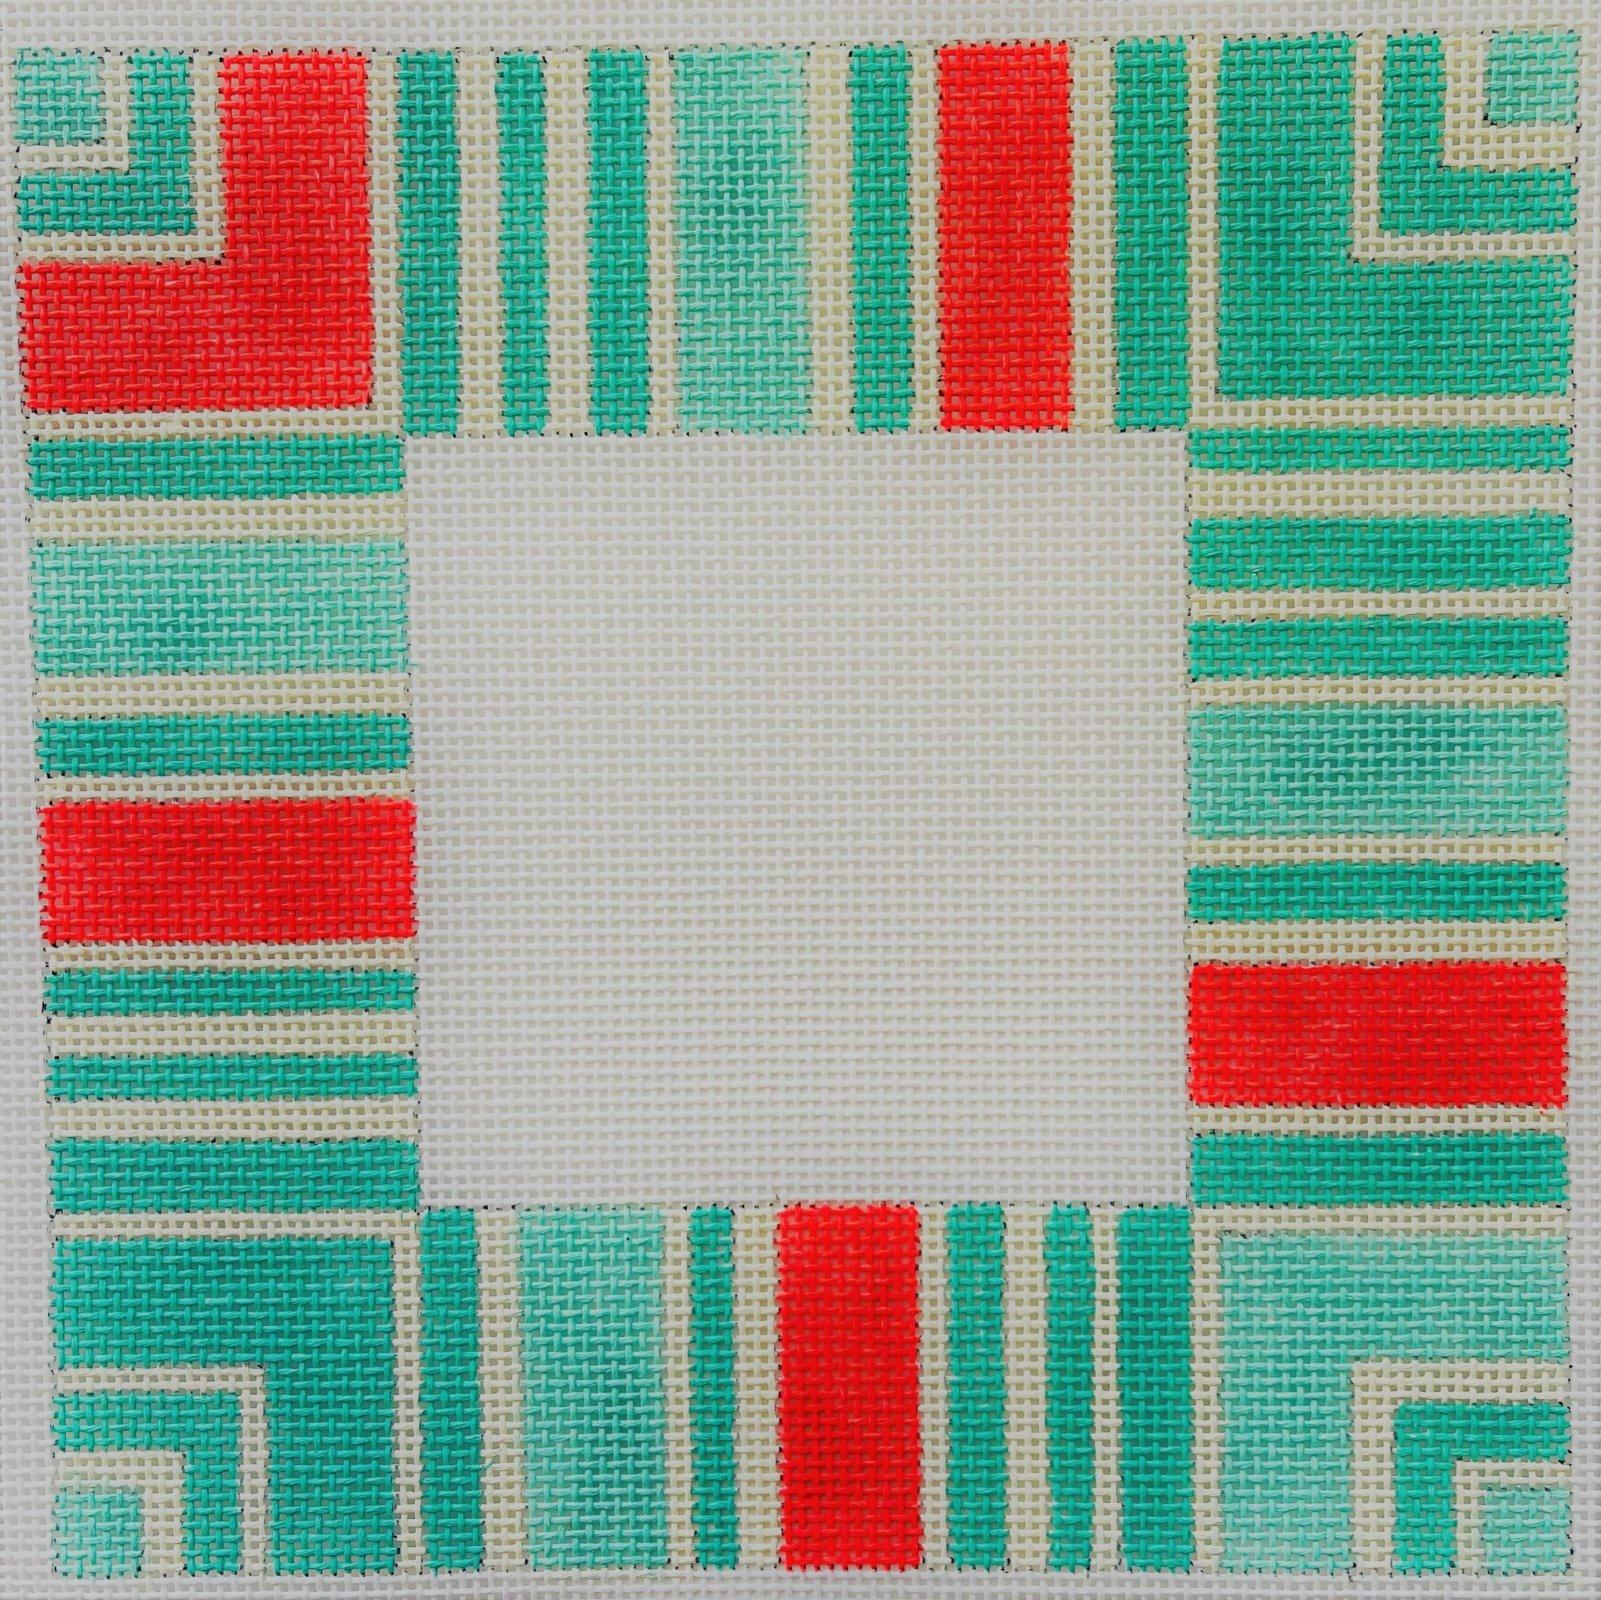 Frame - Strictly Striped in Seafoam